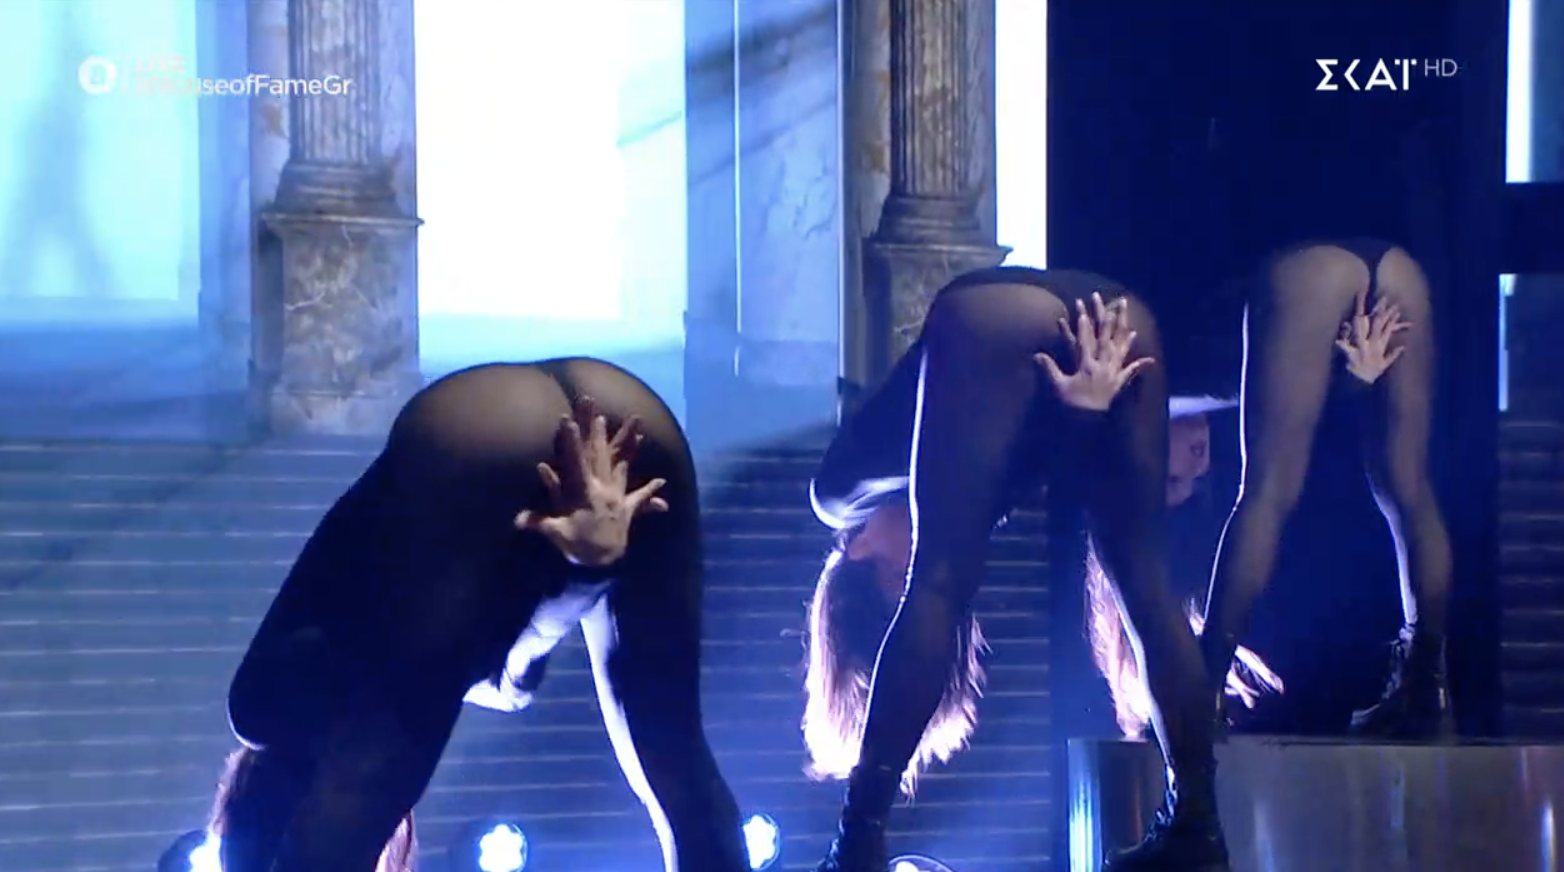 House of Fame LIVE: Το διόλου κατάλληλο πλάvo στον αέρα του ΣΚΑΪ (Pic & Vid)